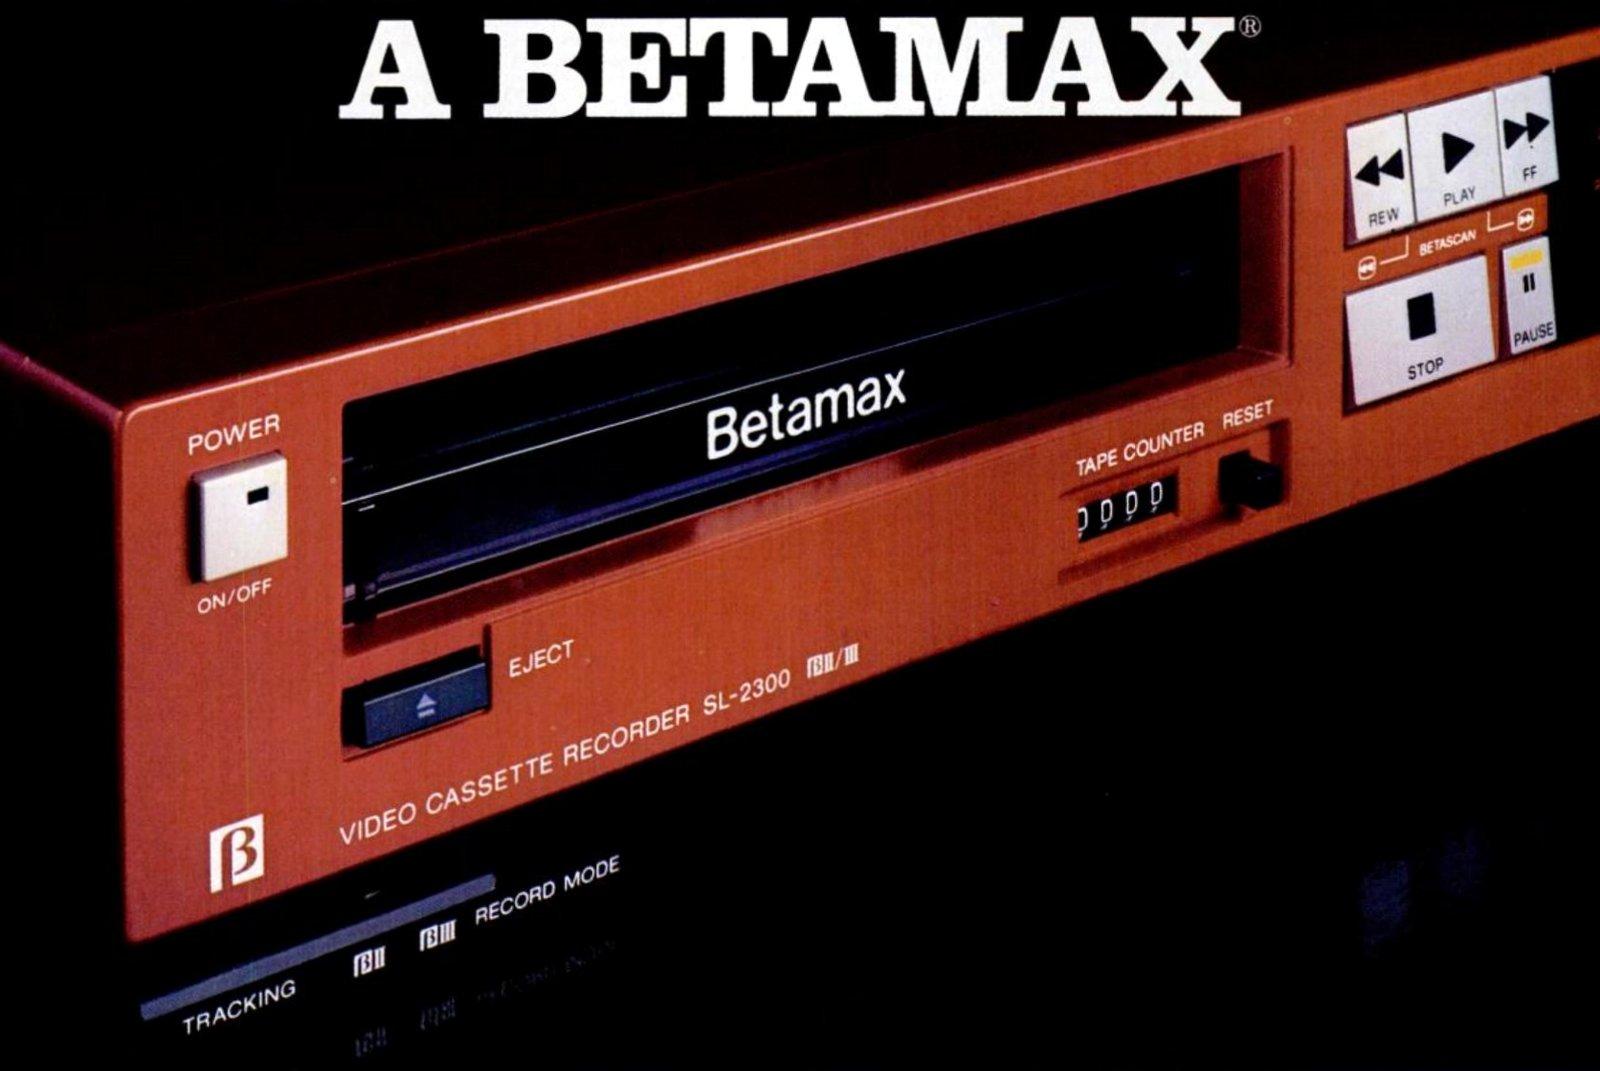 Vintage-tech-1984-Sony-Betamax-VCR.jpg